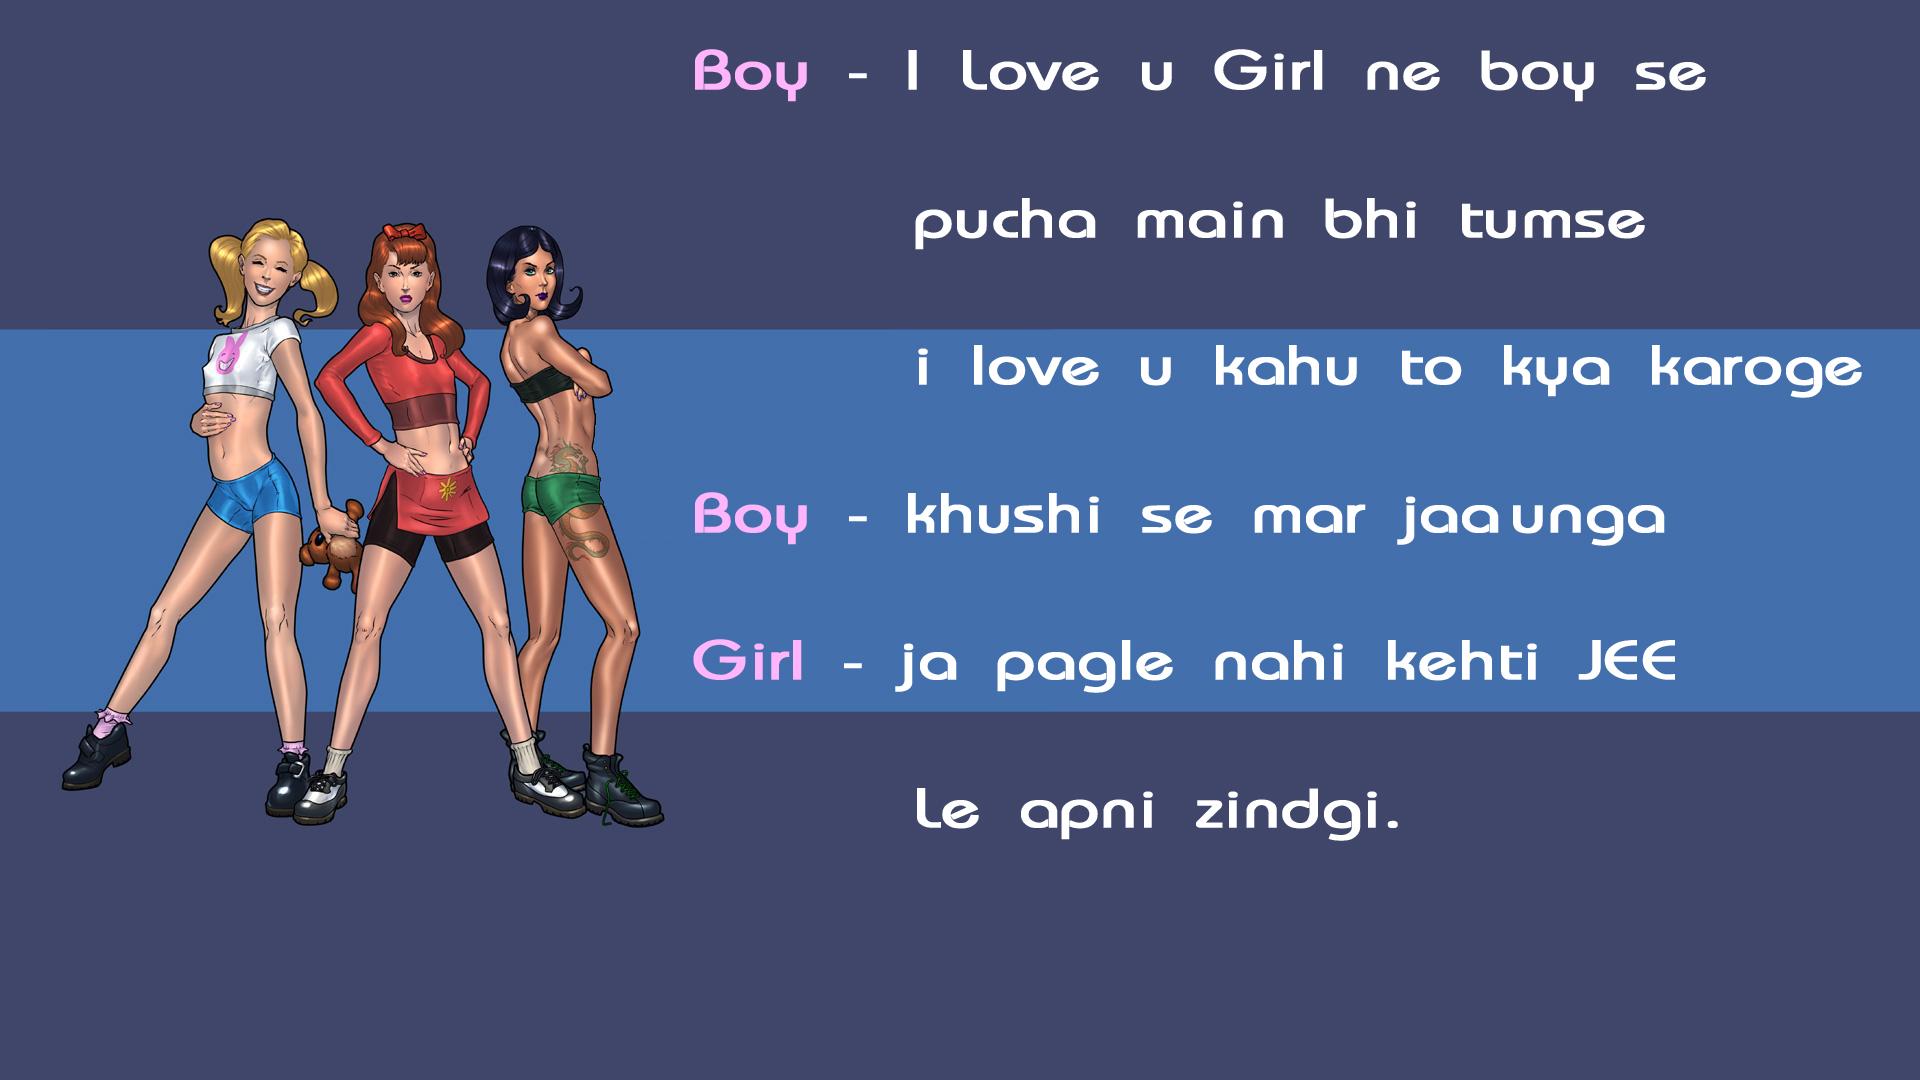 boy girl hindi funny jokes wallpaper Jokes Cards 1920x1080